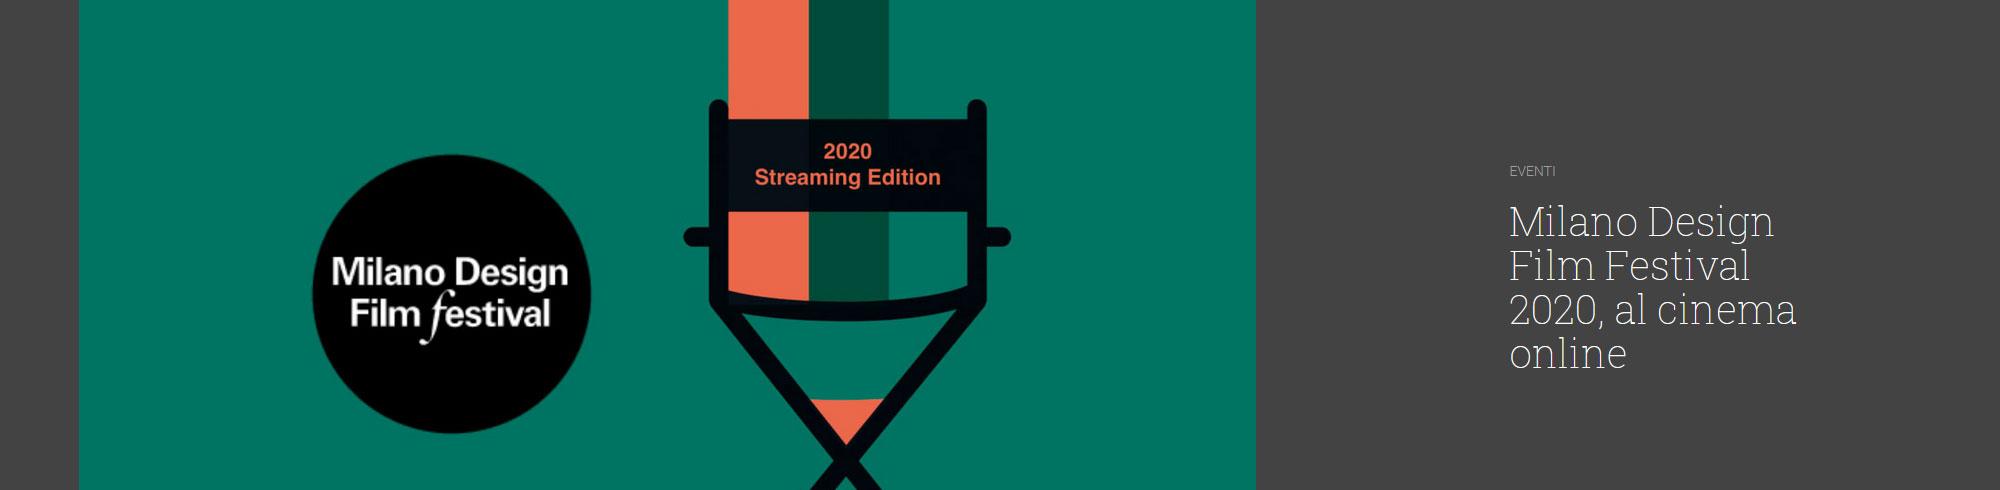 Milano-design-film-festival-2020-al-cinema-online